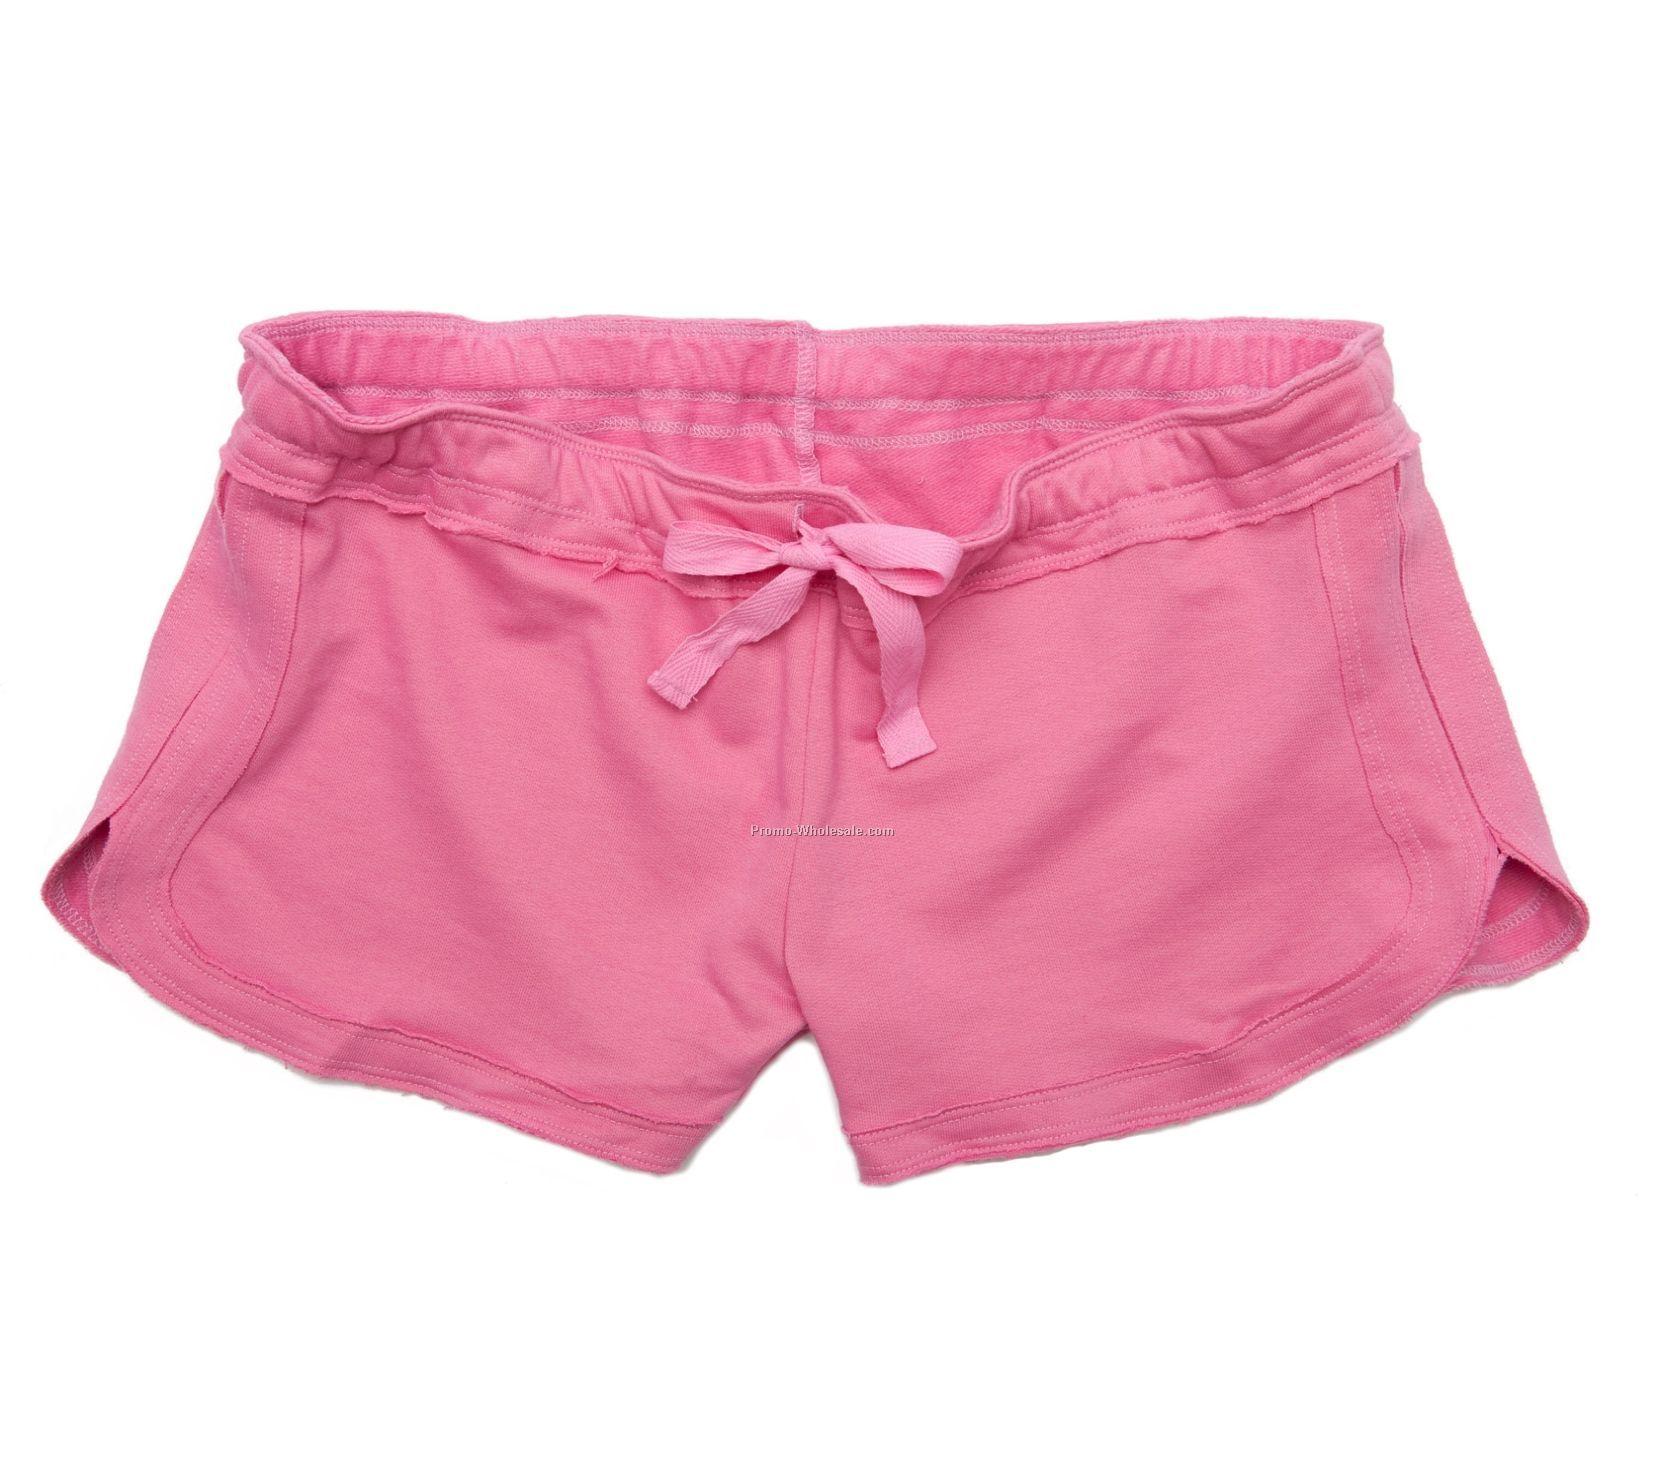 Adult Pink Chrissy Shorts (Xs-xl)